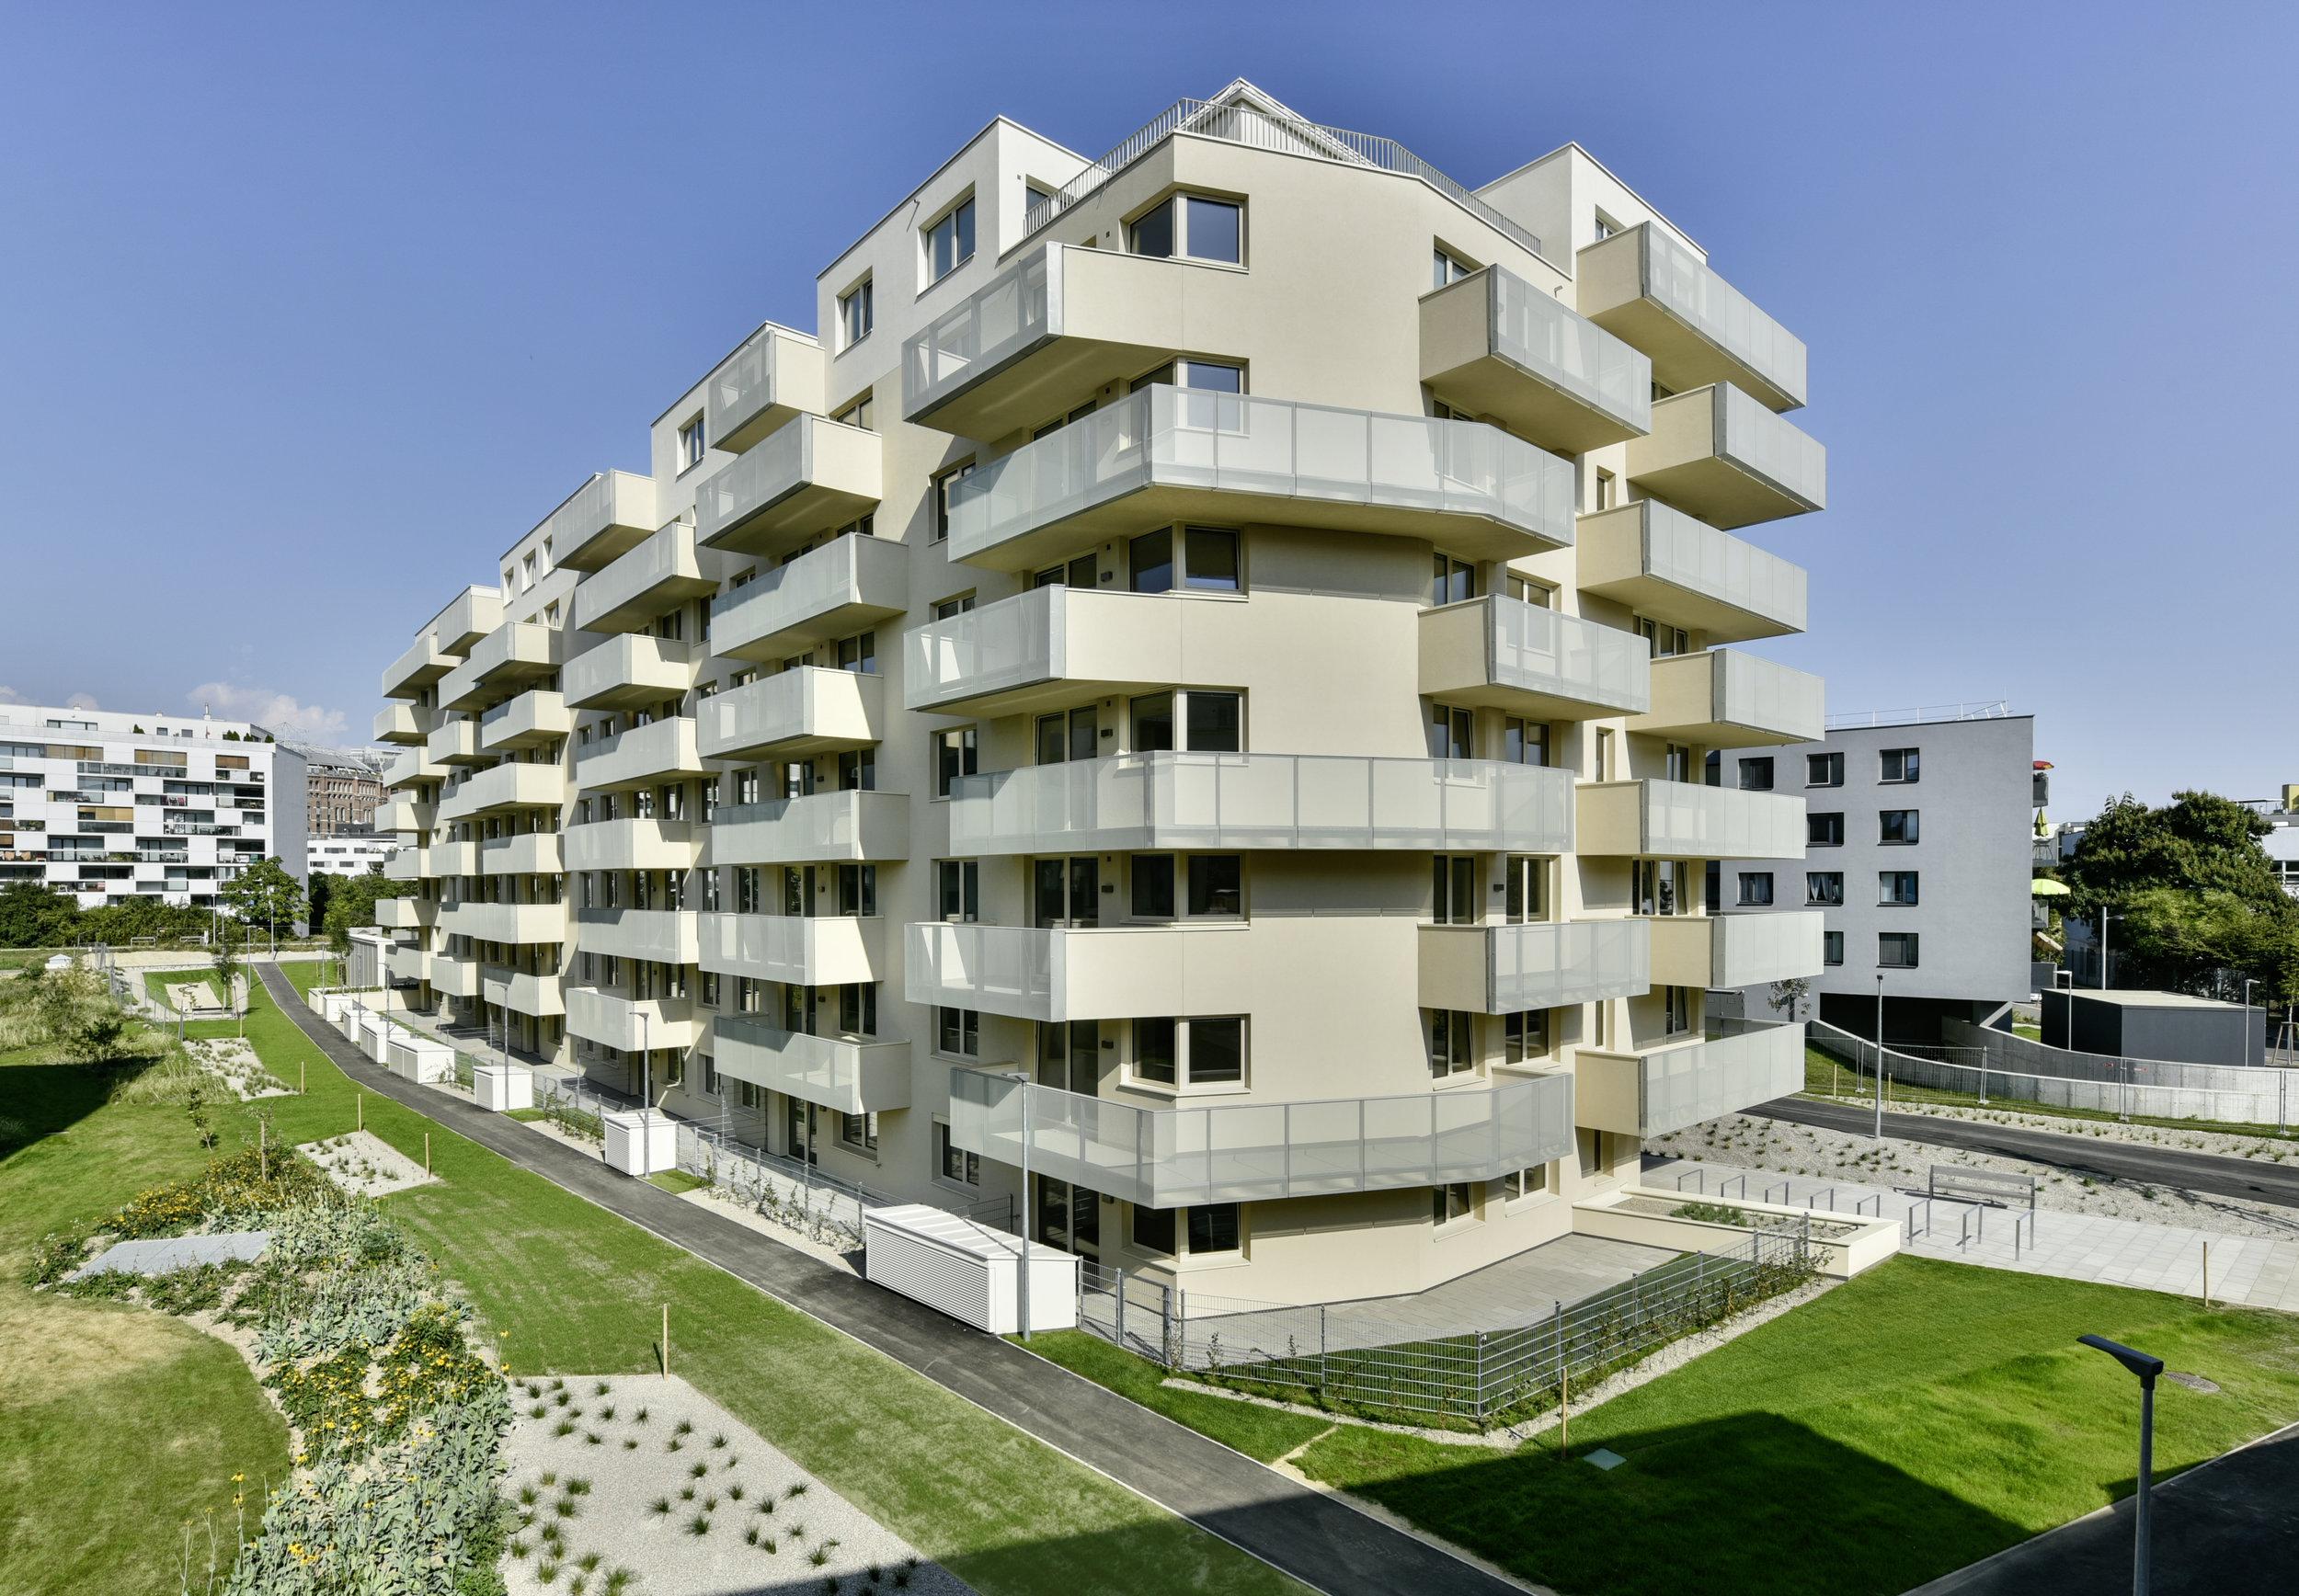 Subsidised Housing - image credit: Lorenz Reiter